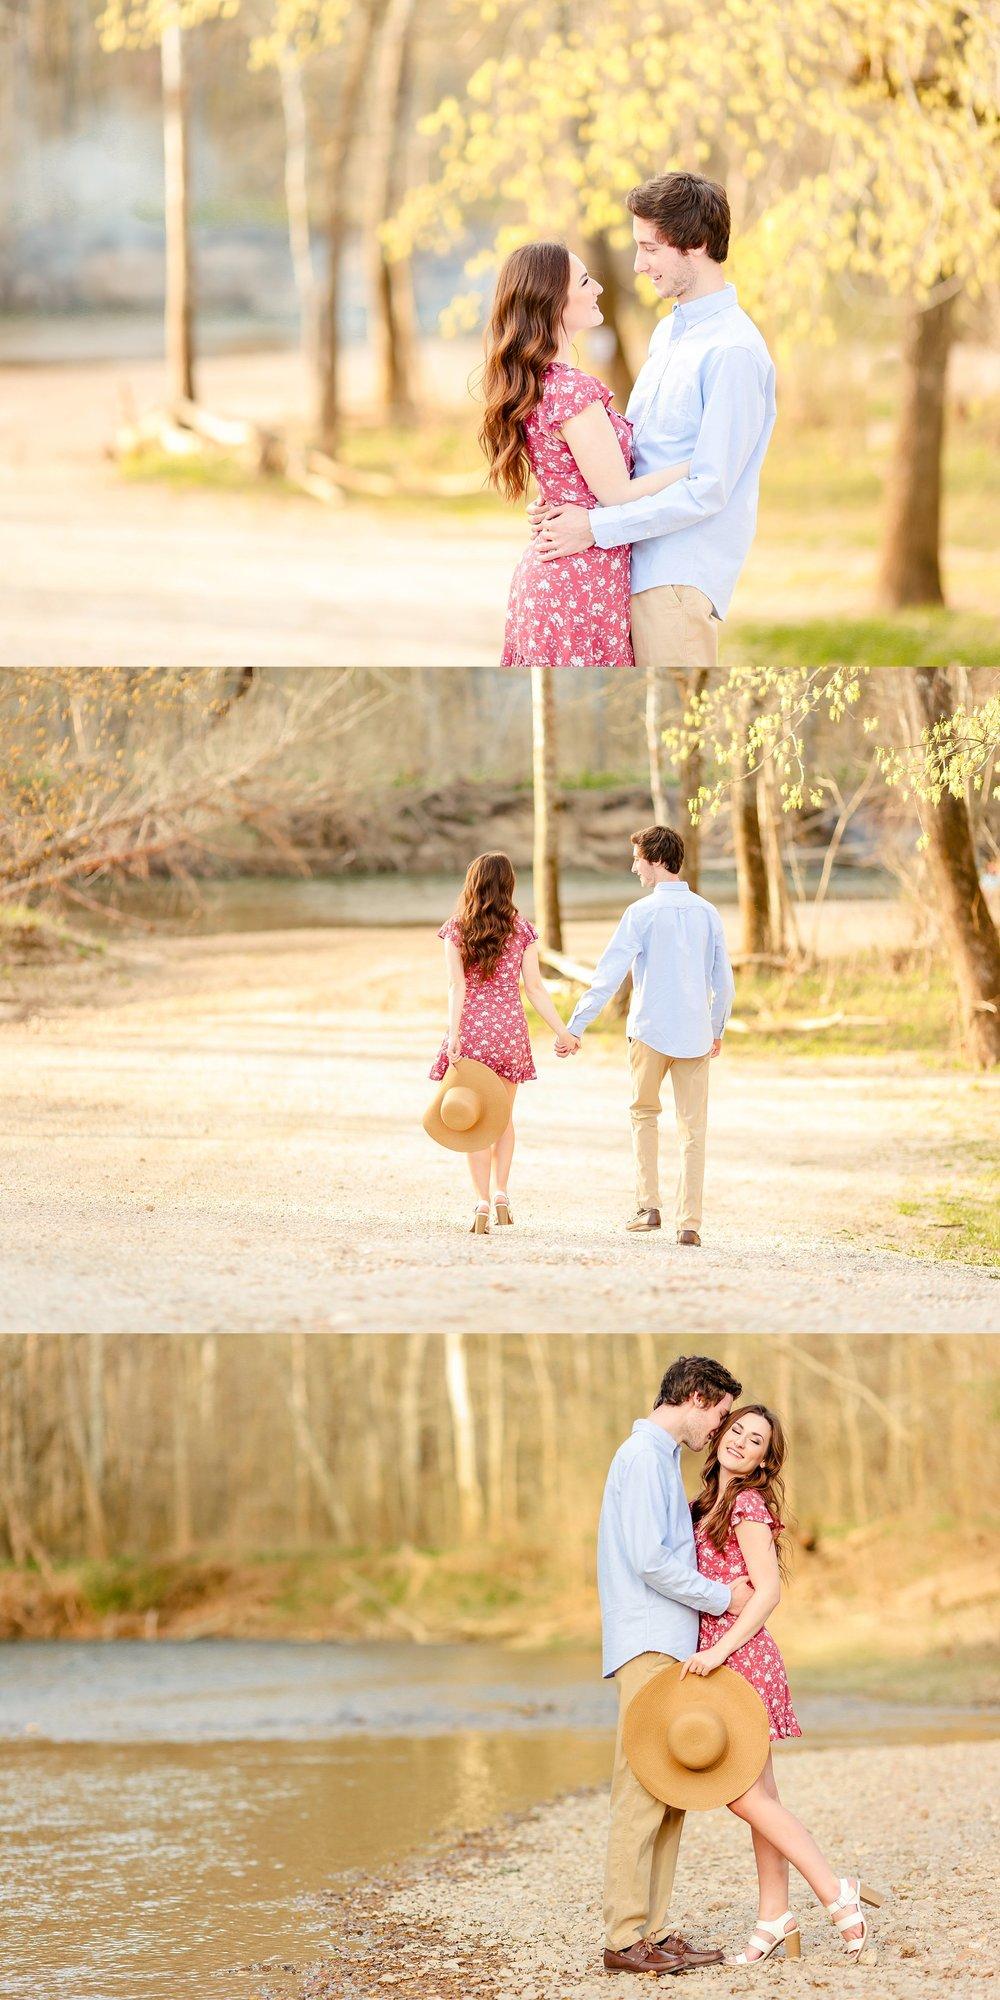 photographer_wedding_saint_louis_Kansas_City_mountains_Best_Photography_engagement_Lake_Ozark_KC_MO_STL_Rolla_Hermann_Saint_James_Missouri_Liquid_art_winery_Kansas_0731.jpg